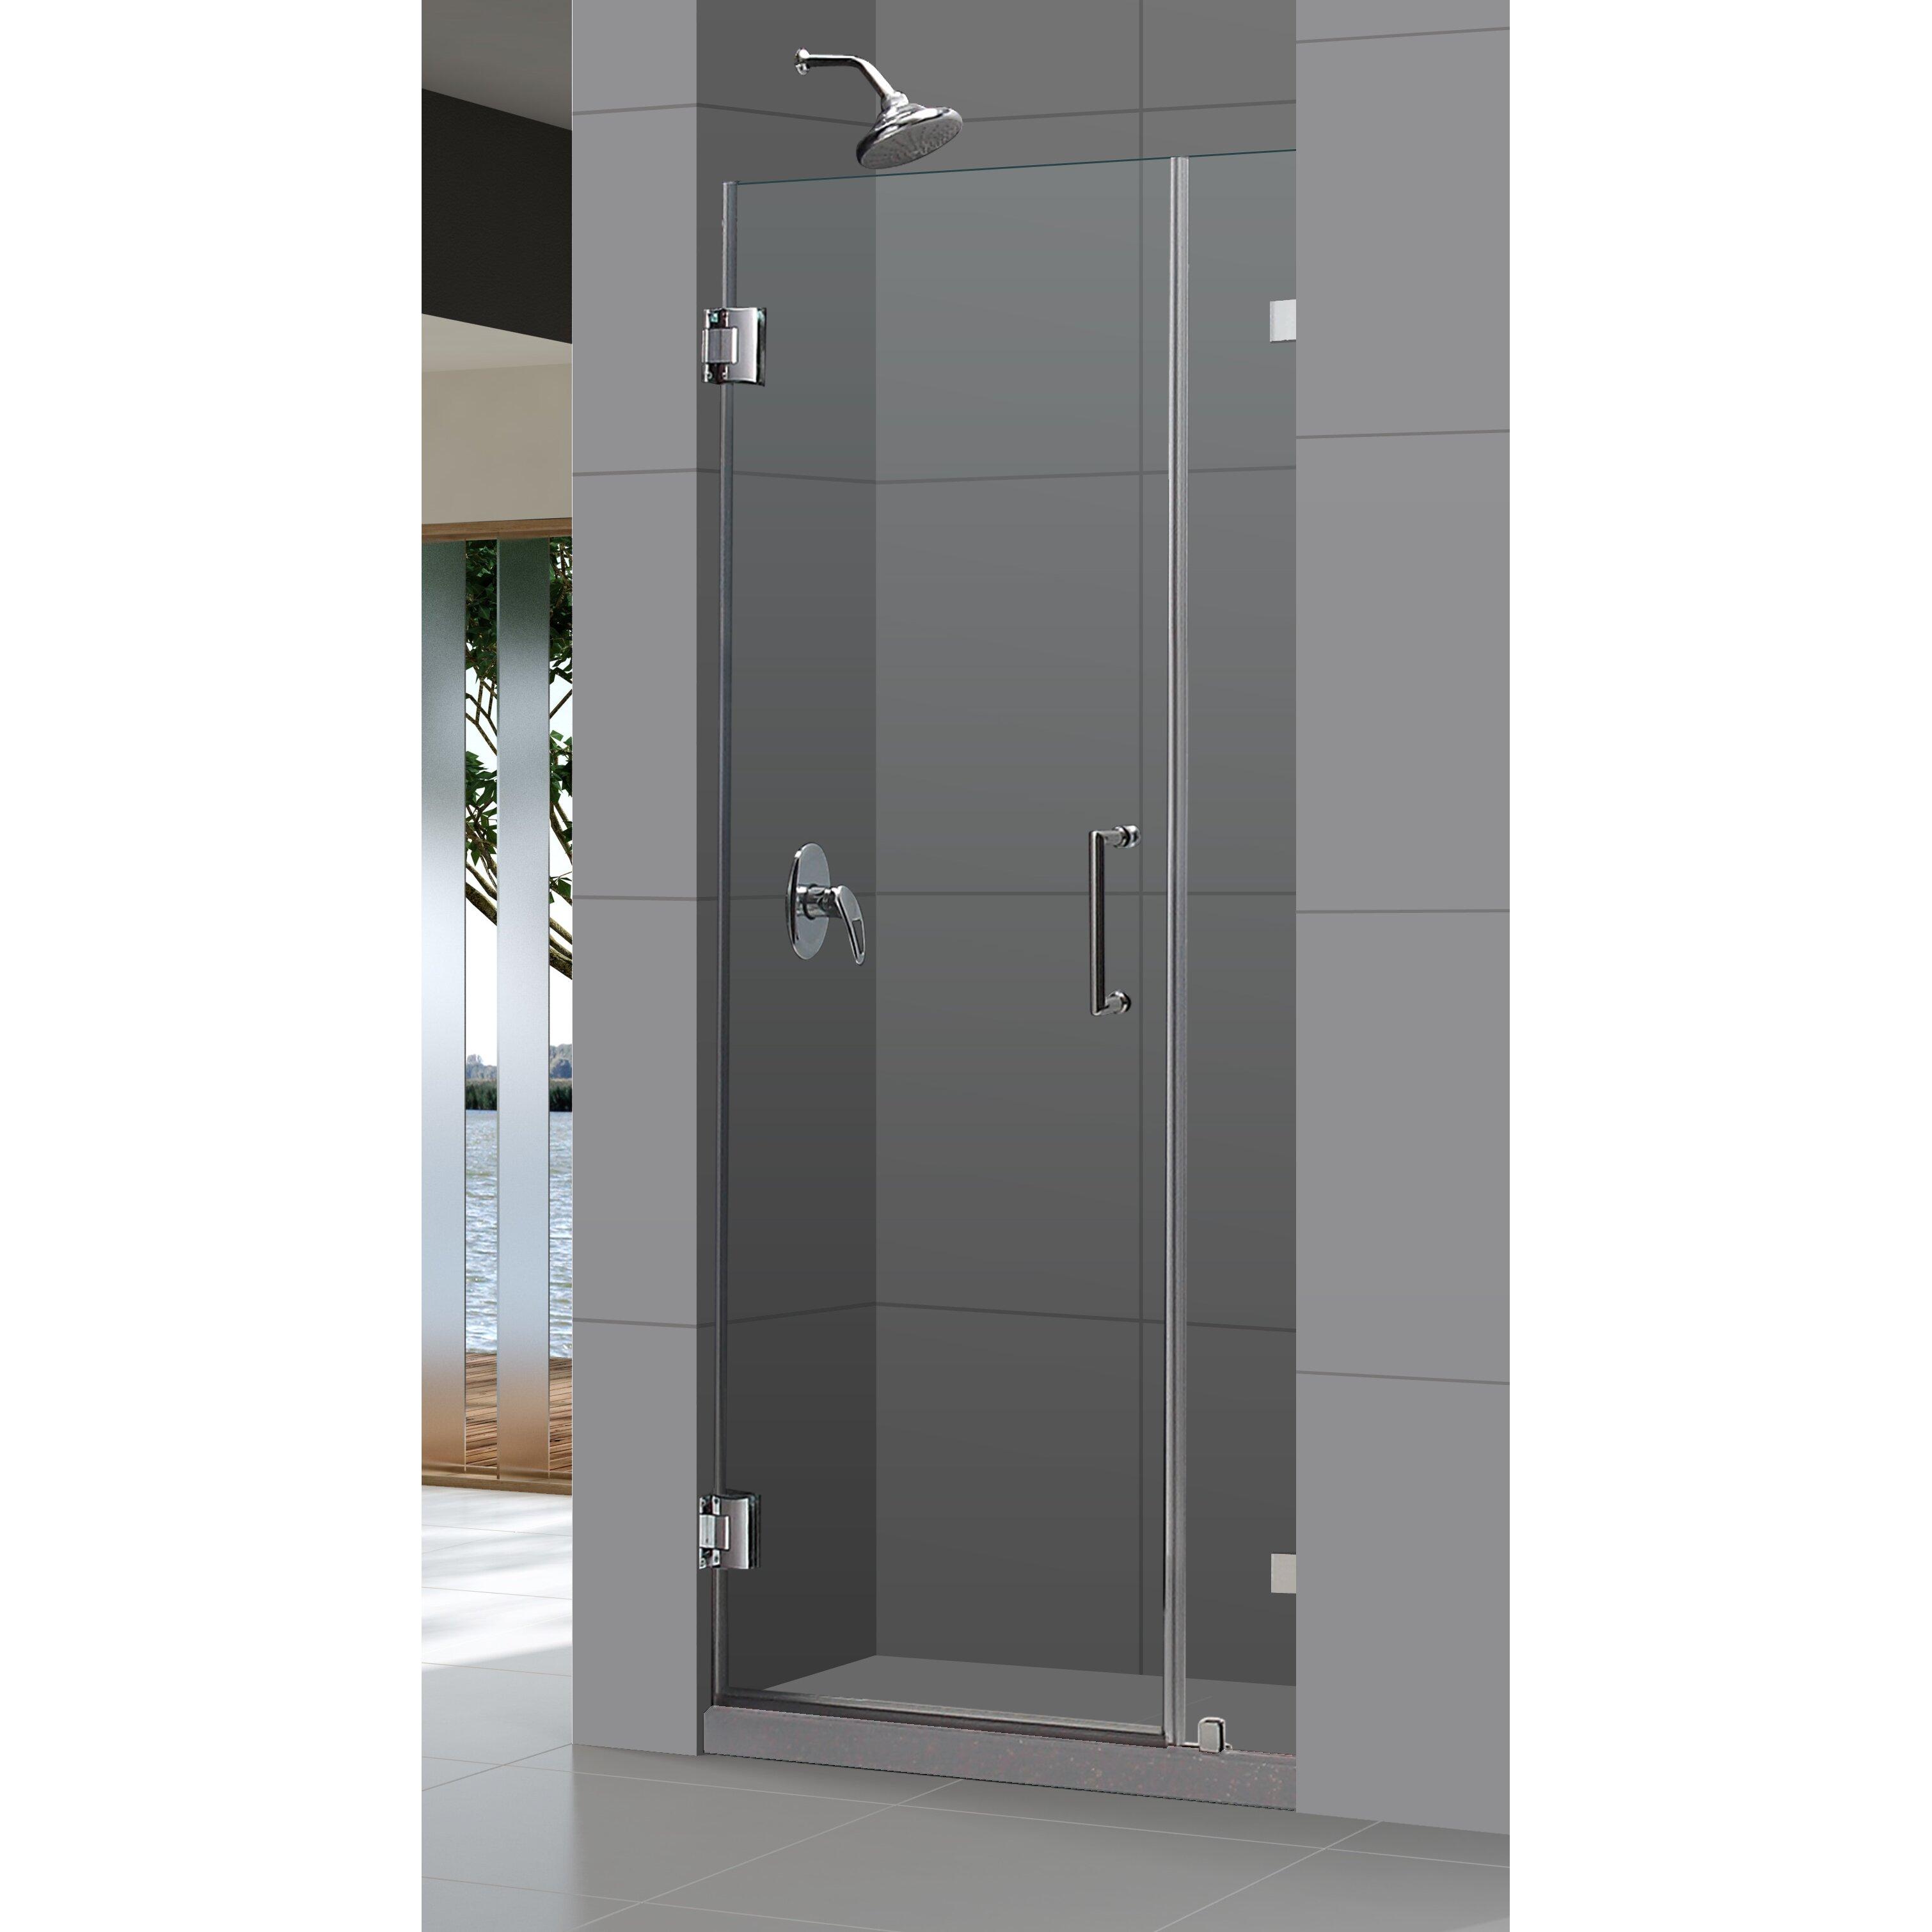 Clear Glass Hinged Shower Door : Dreamline unidoor lux quot pivot frameless hinged